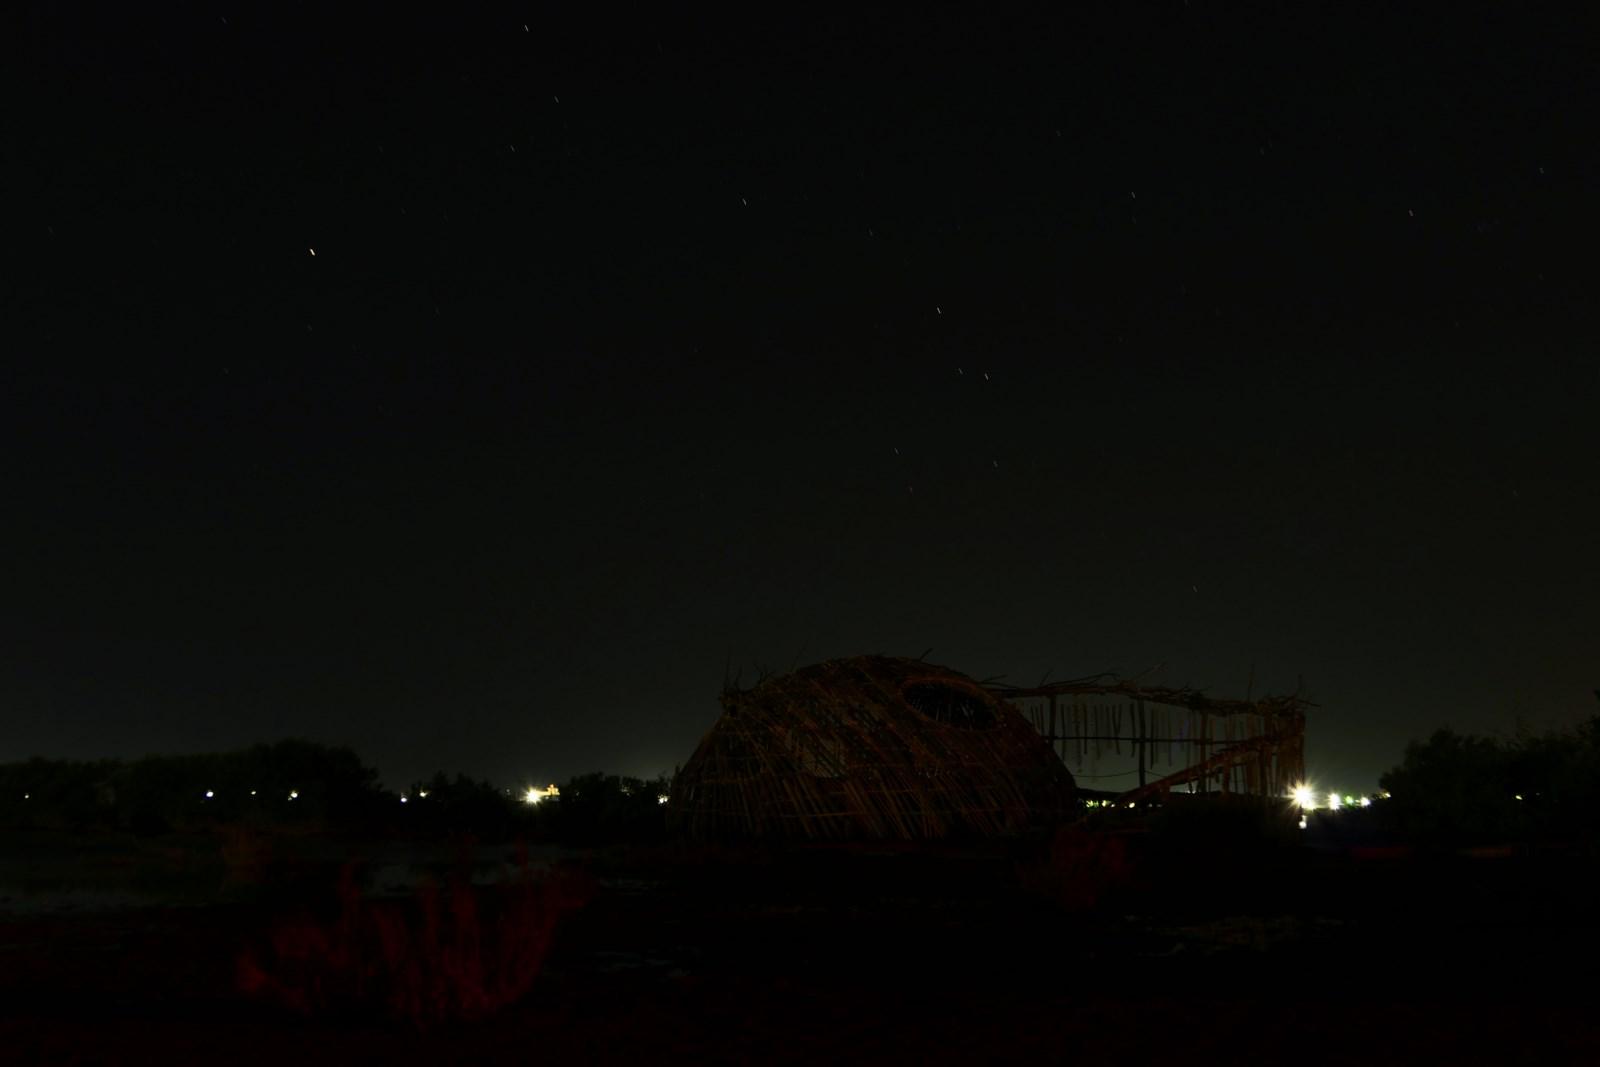 Chenglong shelter_night [1600x1200]